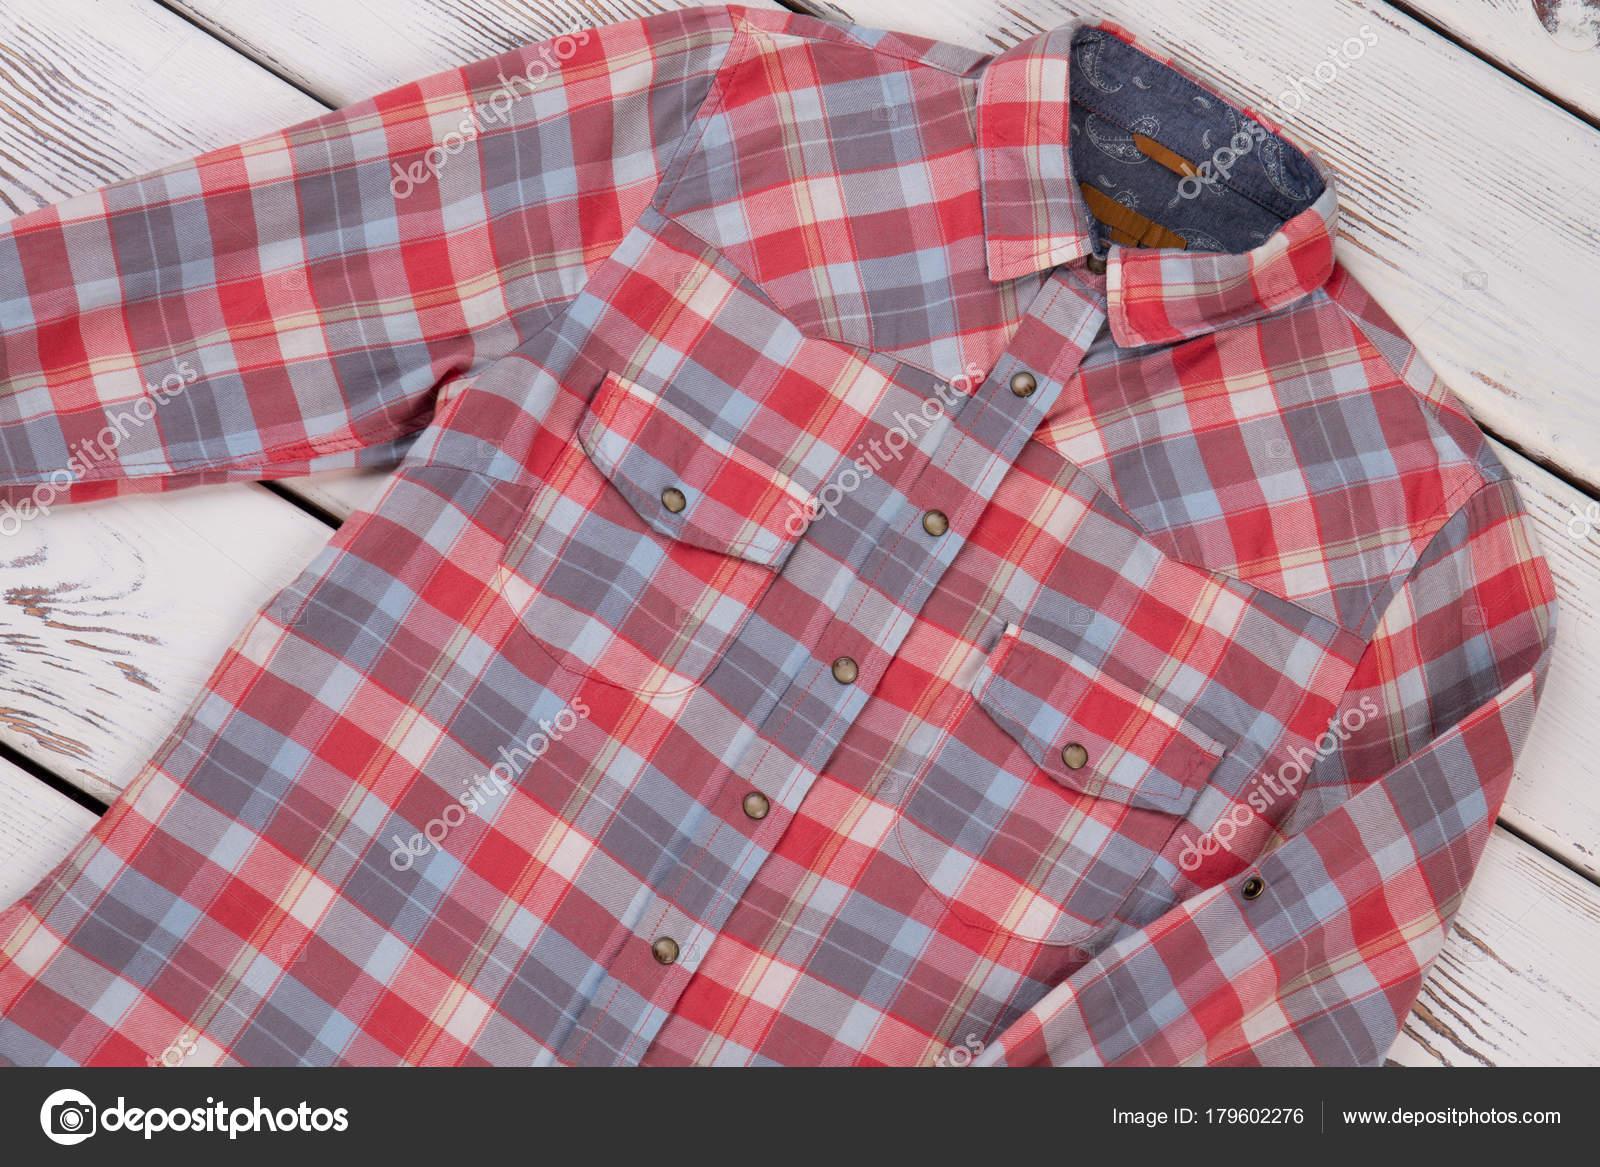 0f893fc73f Női kockás ing — Stock Fotó © margostock #179602276